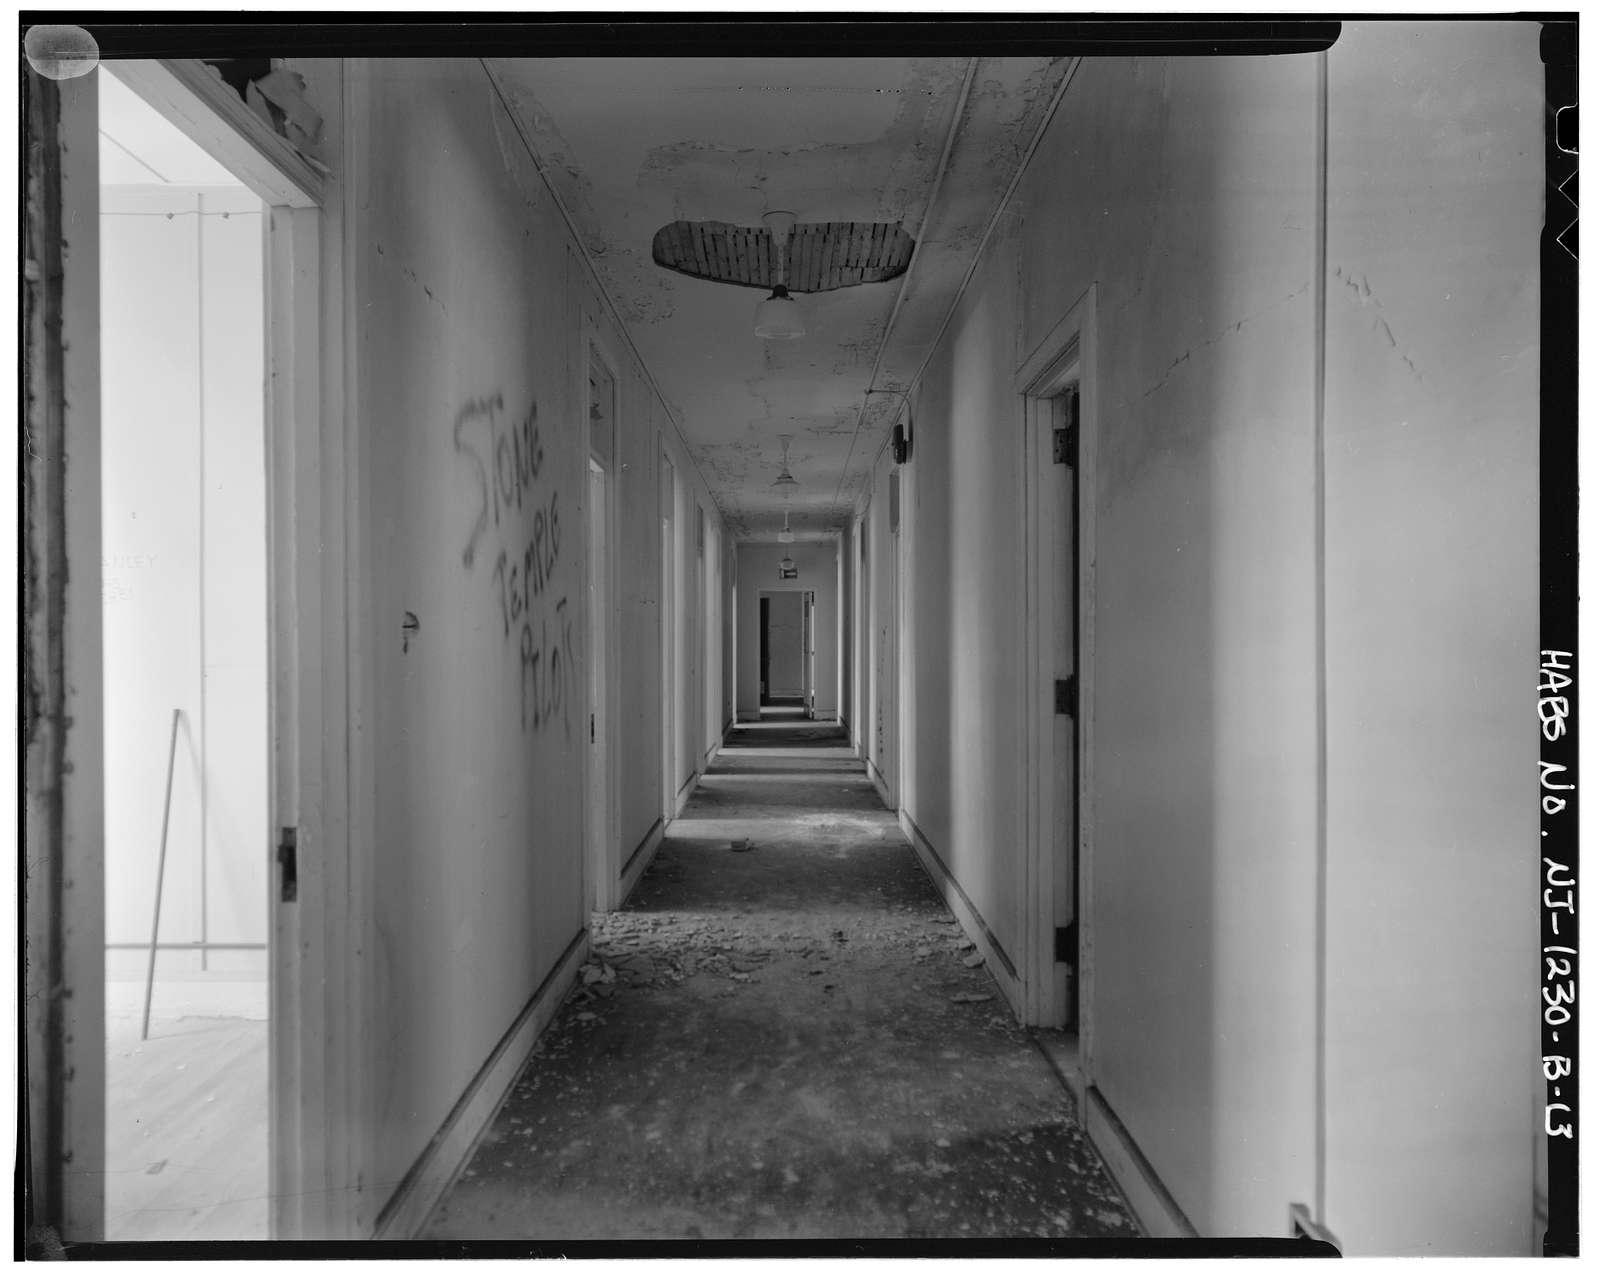 New Jersey State Tuberculosis Sanatorium, Employee Dormitory, Pavilion Road, .3 mile west of intersection with Sanatorium Road, Glen Gardner, Hunterdon County, NJ